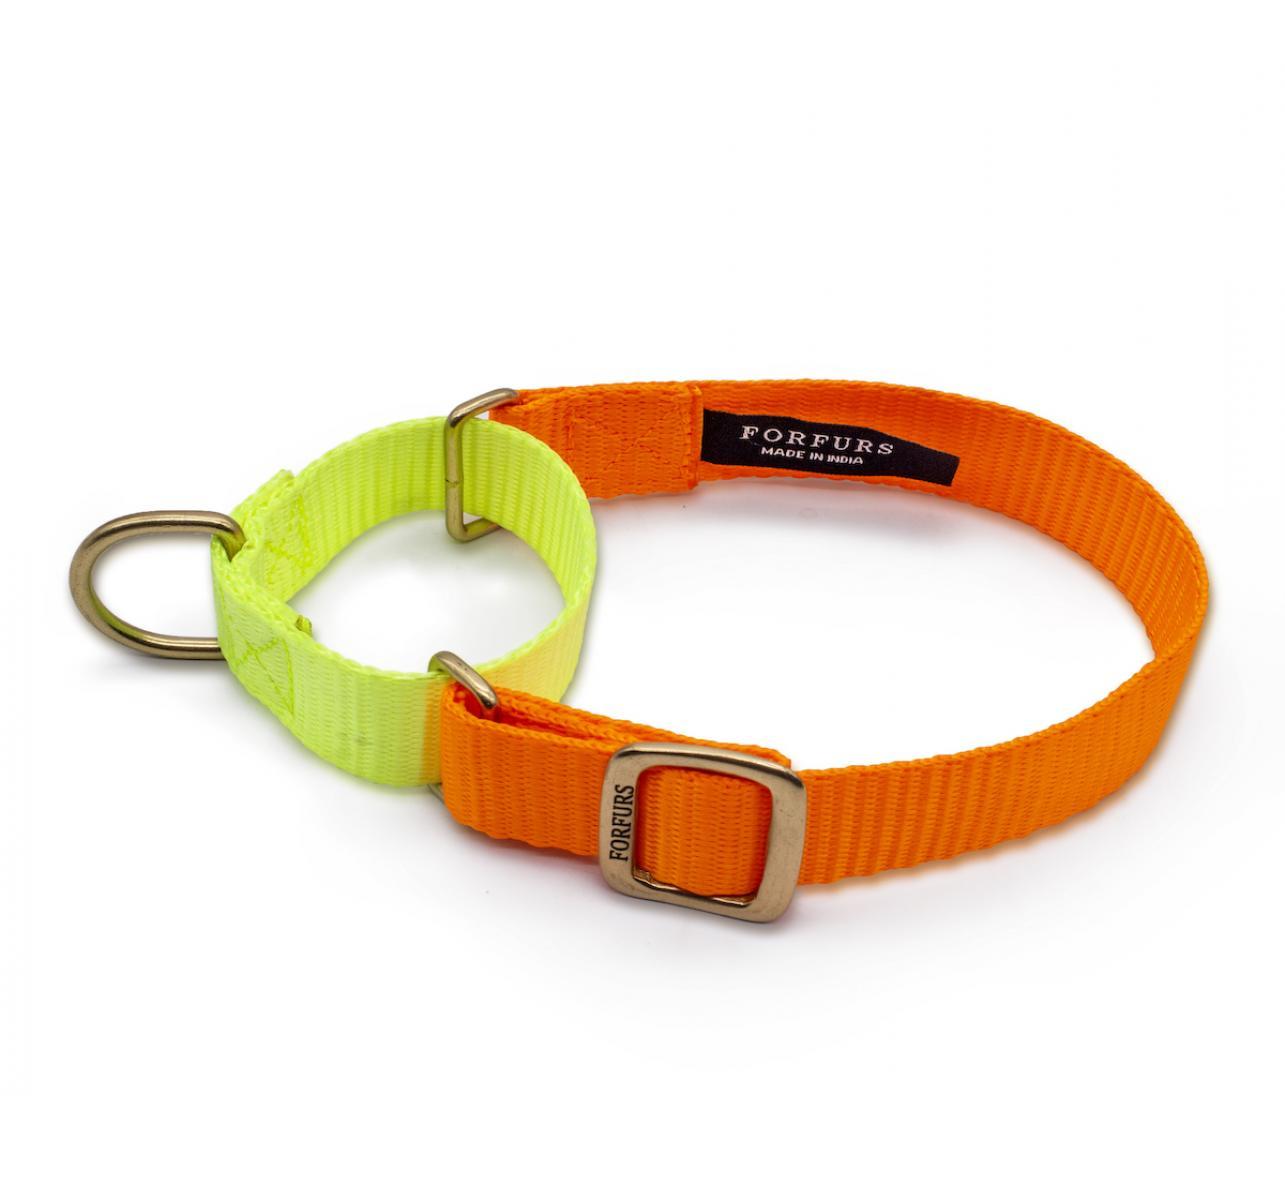 Forfurs Duo Martingale Collar Neon Orange & Lime Green - Large